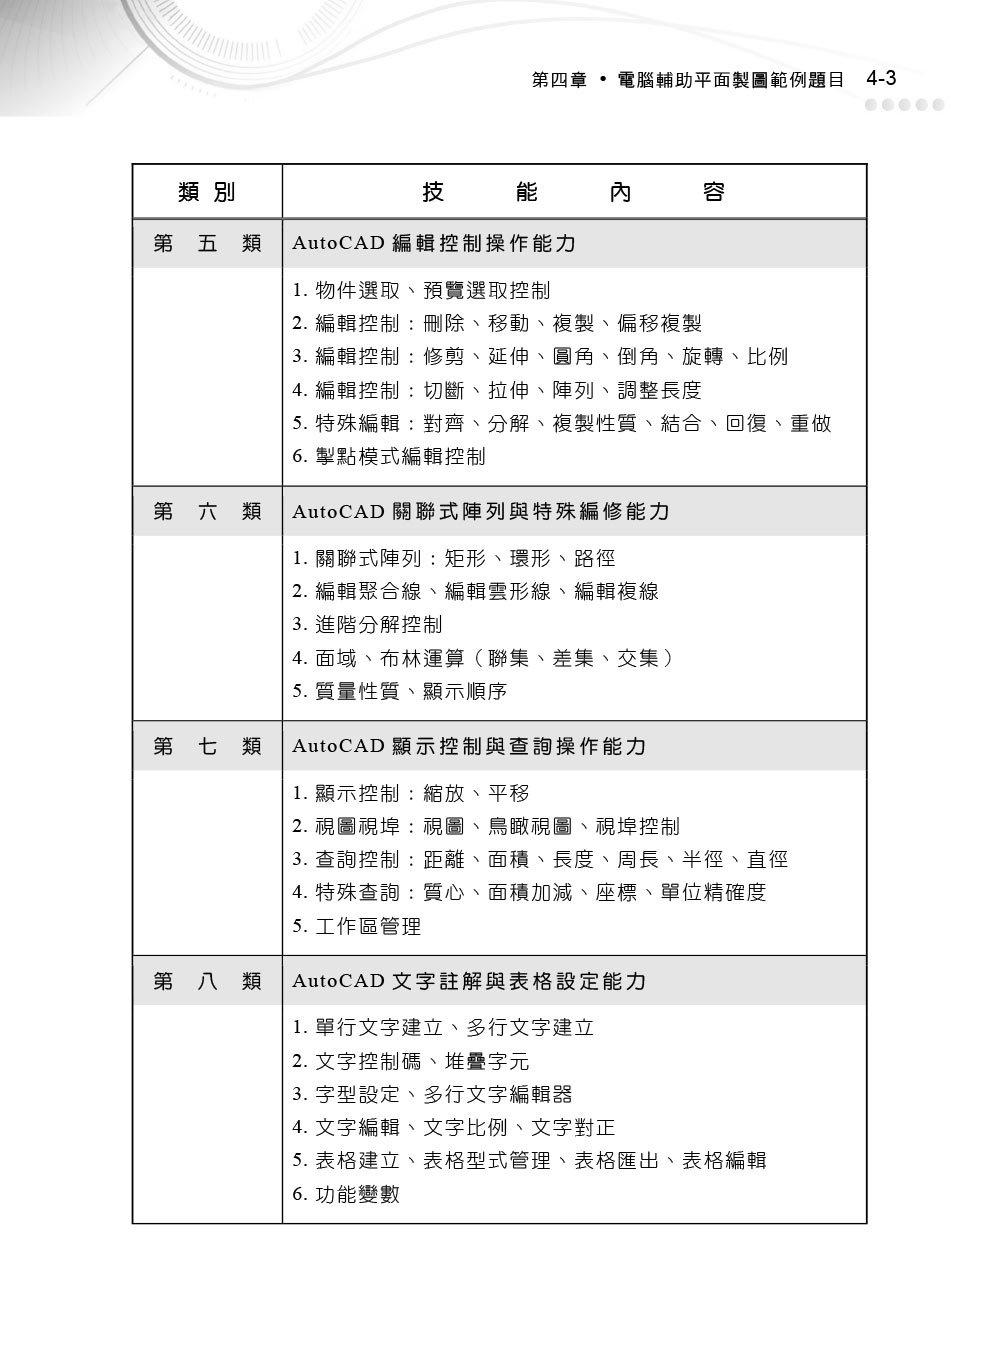 TQC+ 電腦輔助平面製圖認證指南 AutoCAD 2020-preview-3